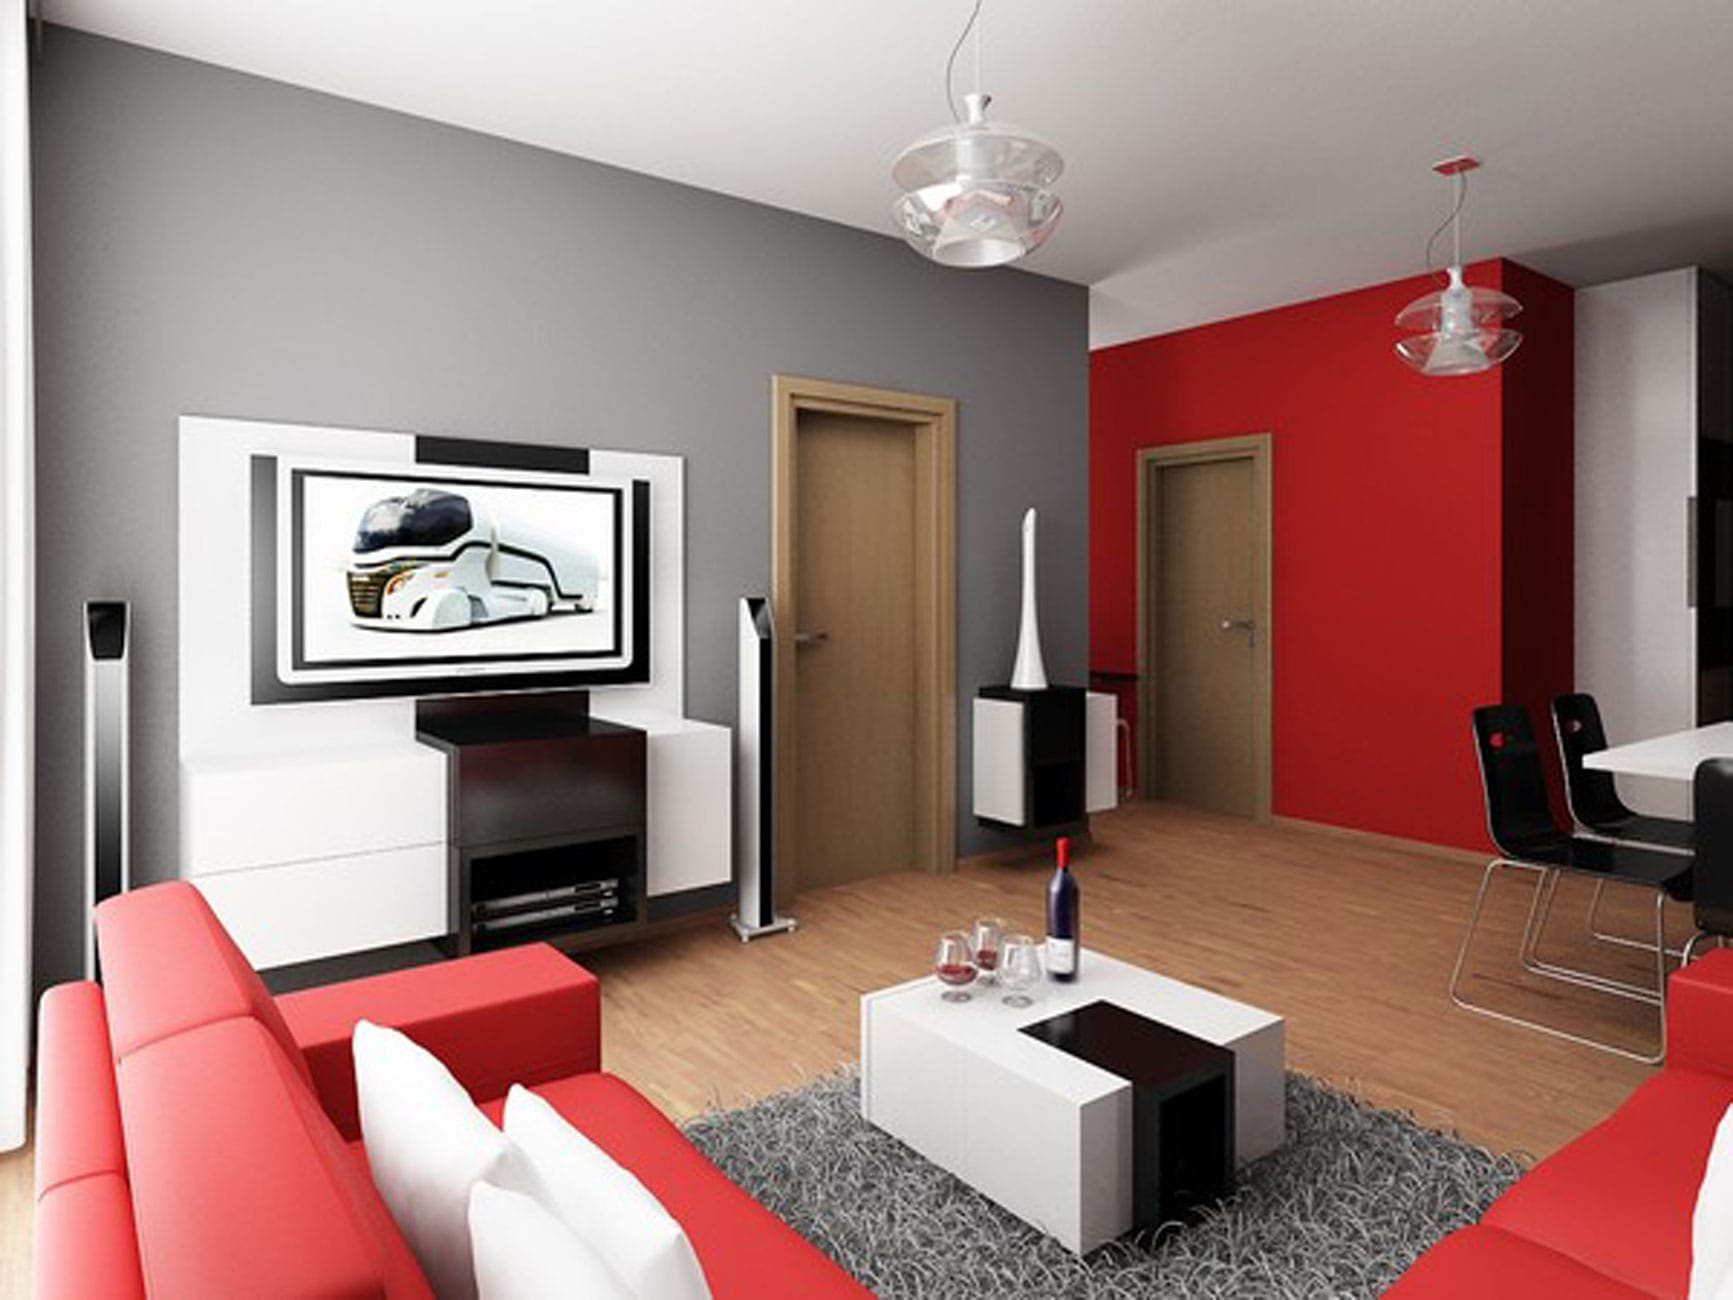 Resultado de imagen de квартиры после ремонта без мебели фото